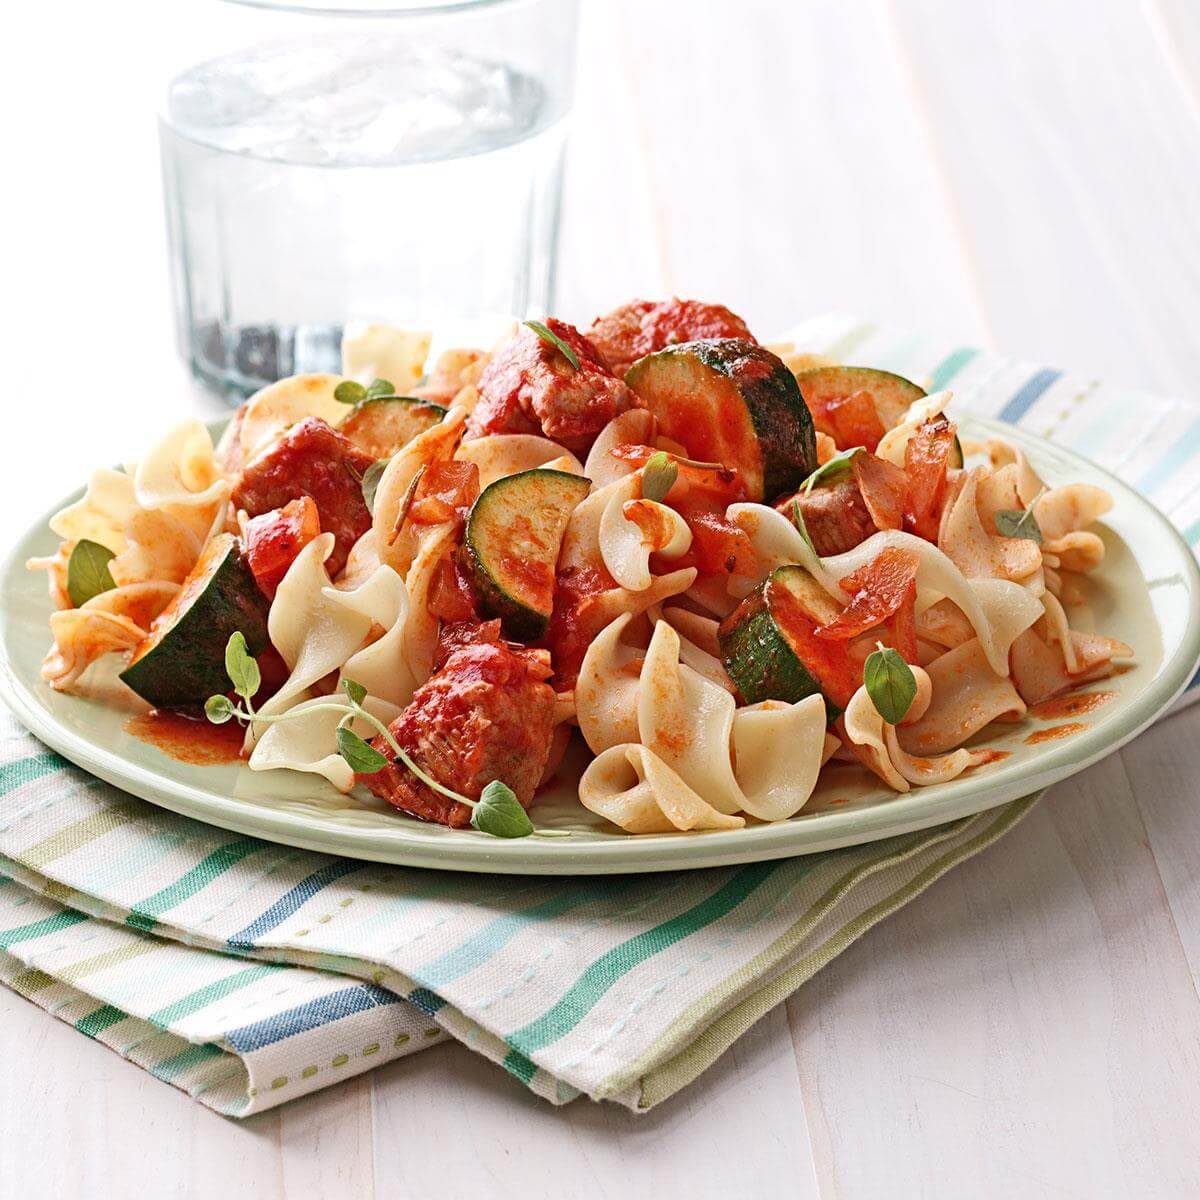 Tasty Dinner Ideas Recipes: Zucchini Pork Dinner Recipe